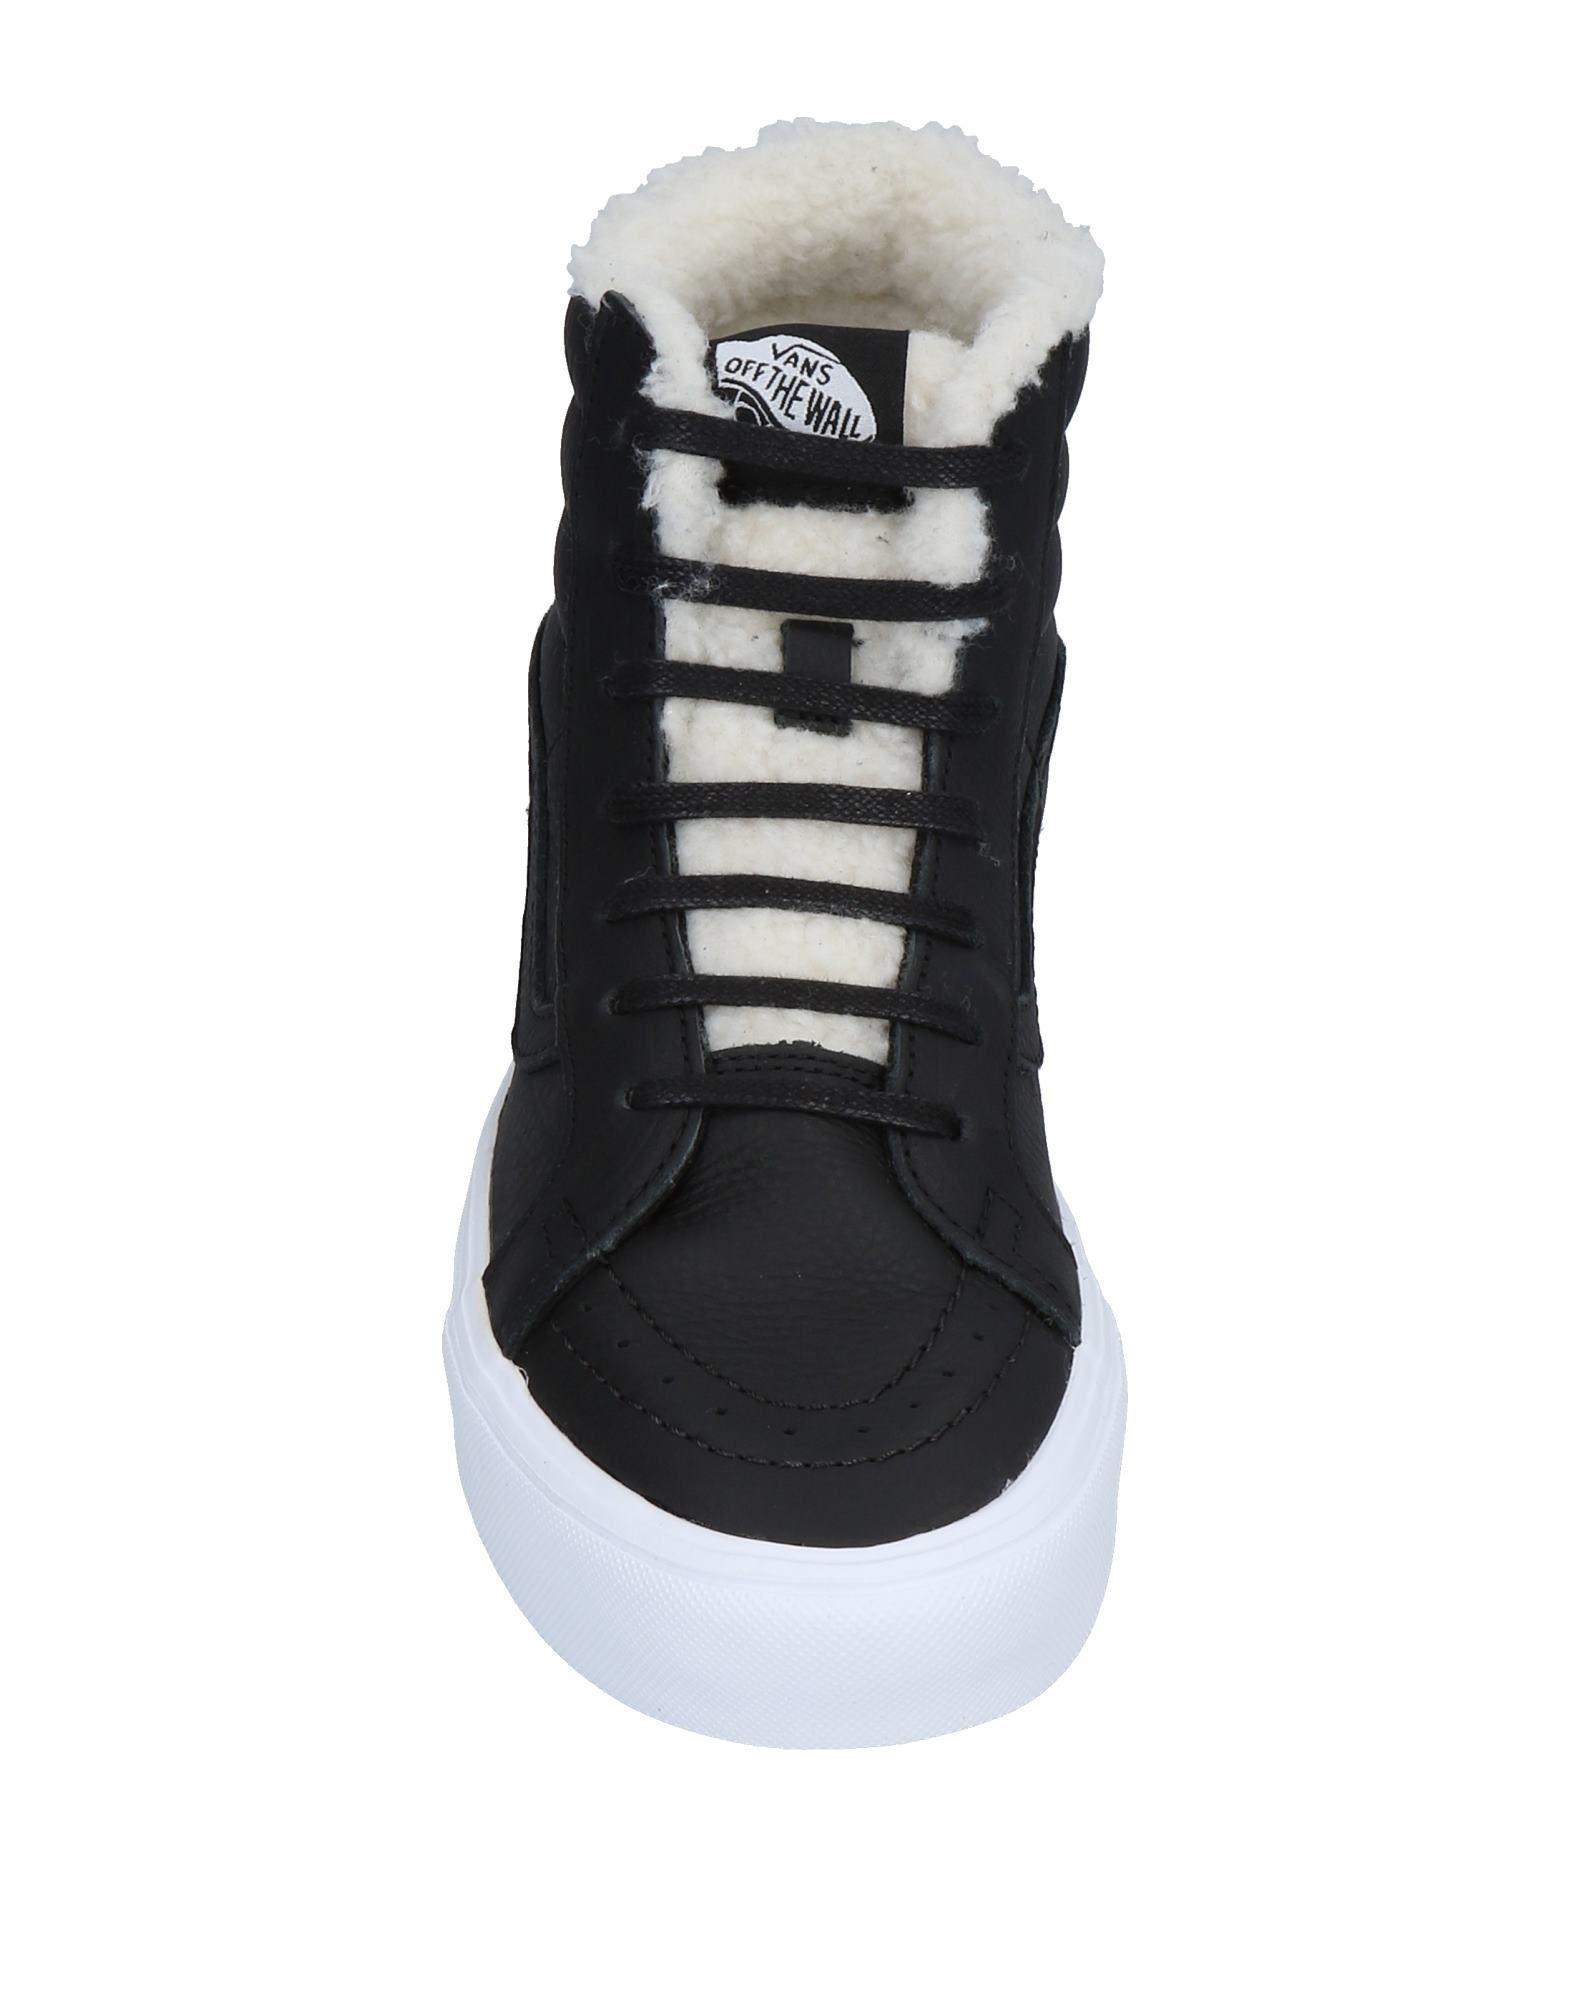 Vans Sneakers Damen  beliebte 11492512MO Gute Qualität beliebte  Schuhe defdab